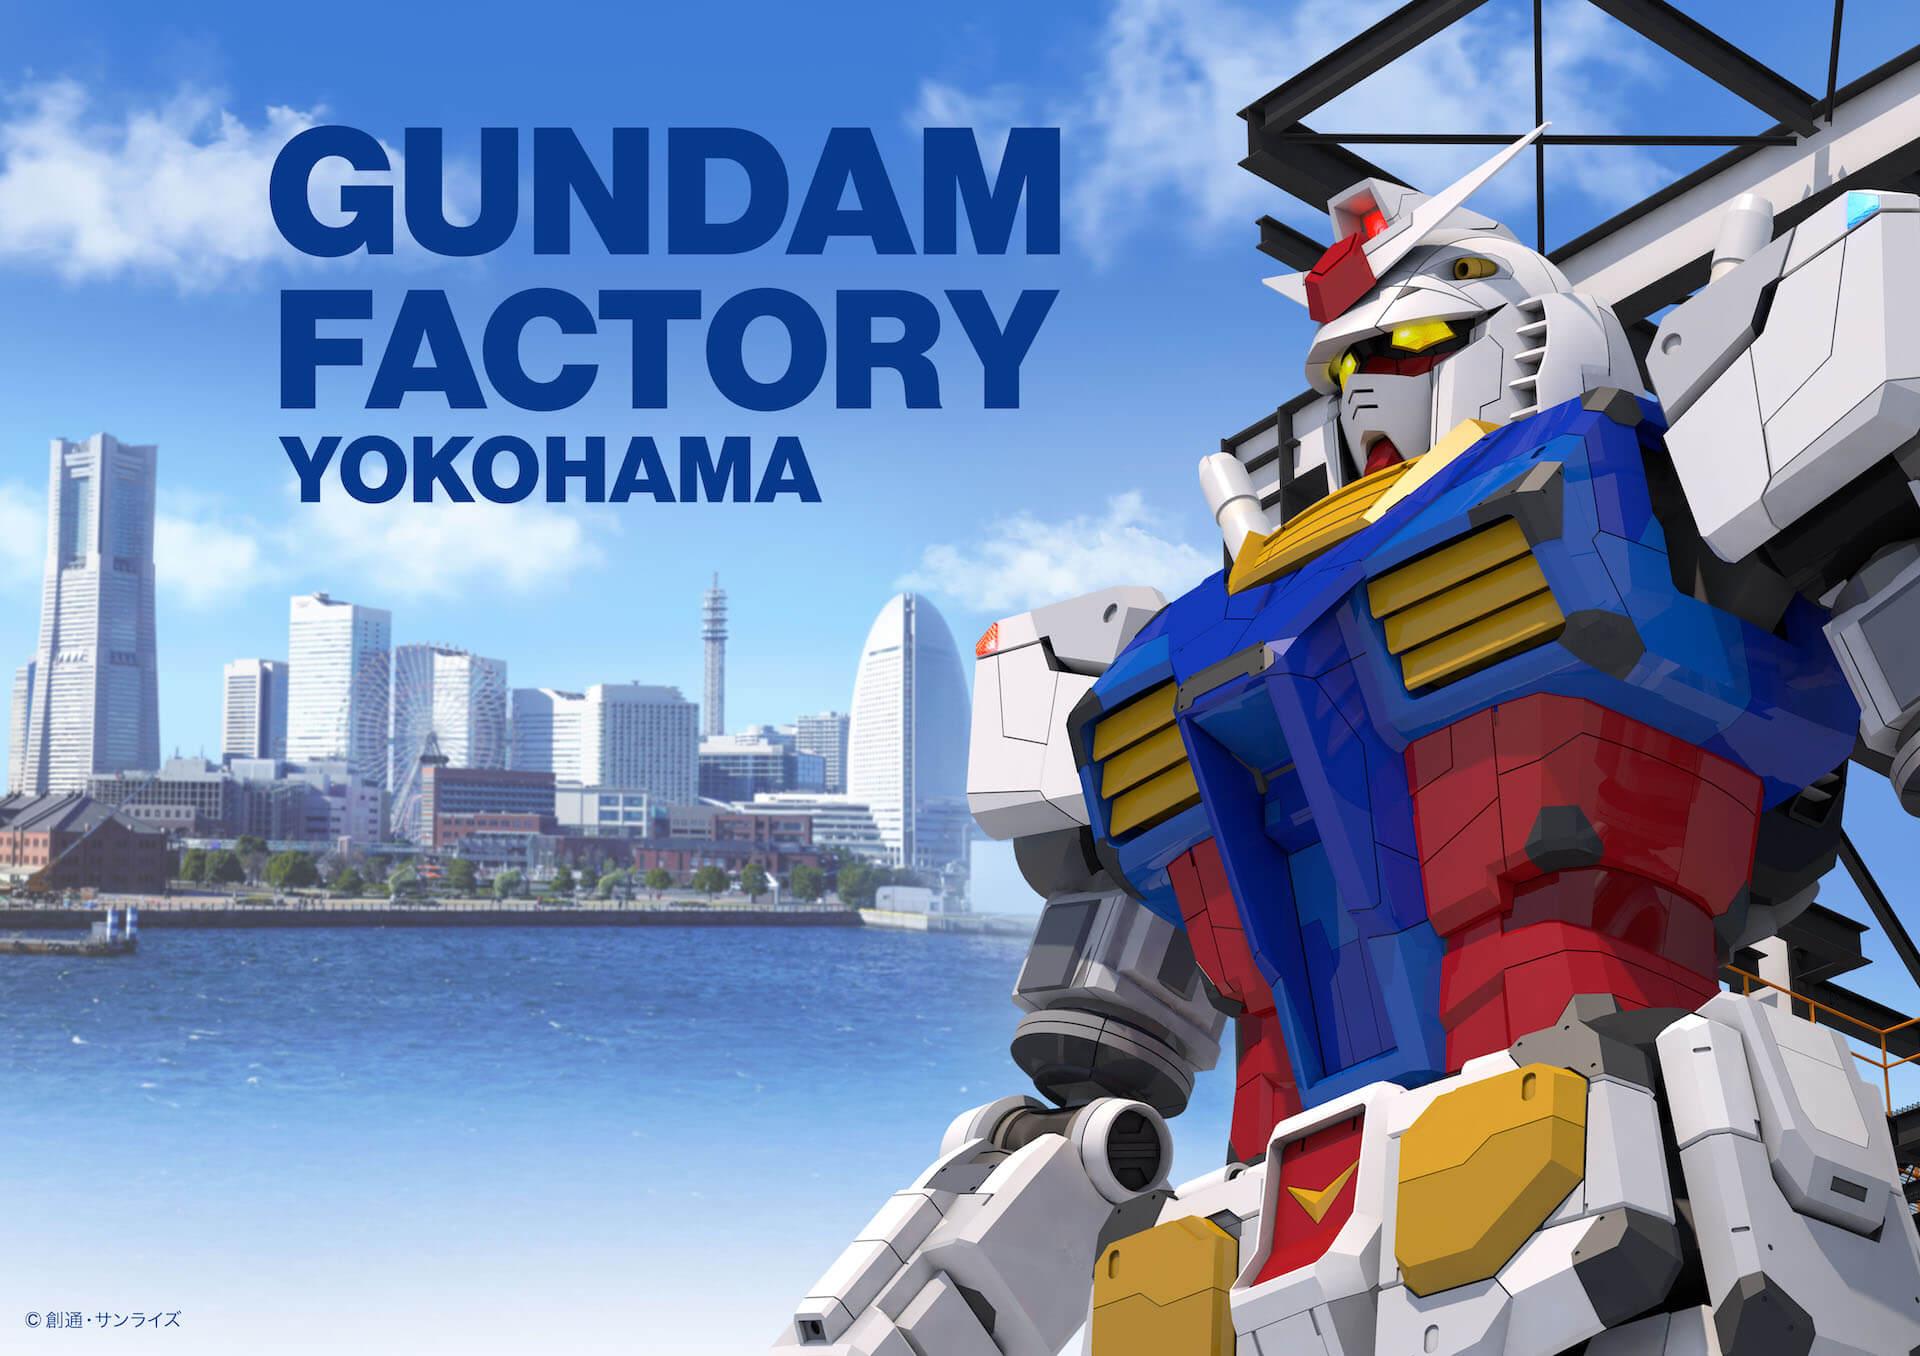 18mの動く実物大ガンダムが横浜に!「GUNDAM FACTORY YOKOHAMA」10月オープン art200120_gundam_6